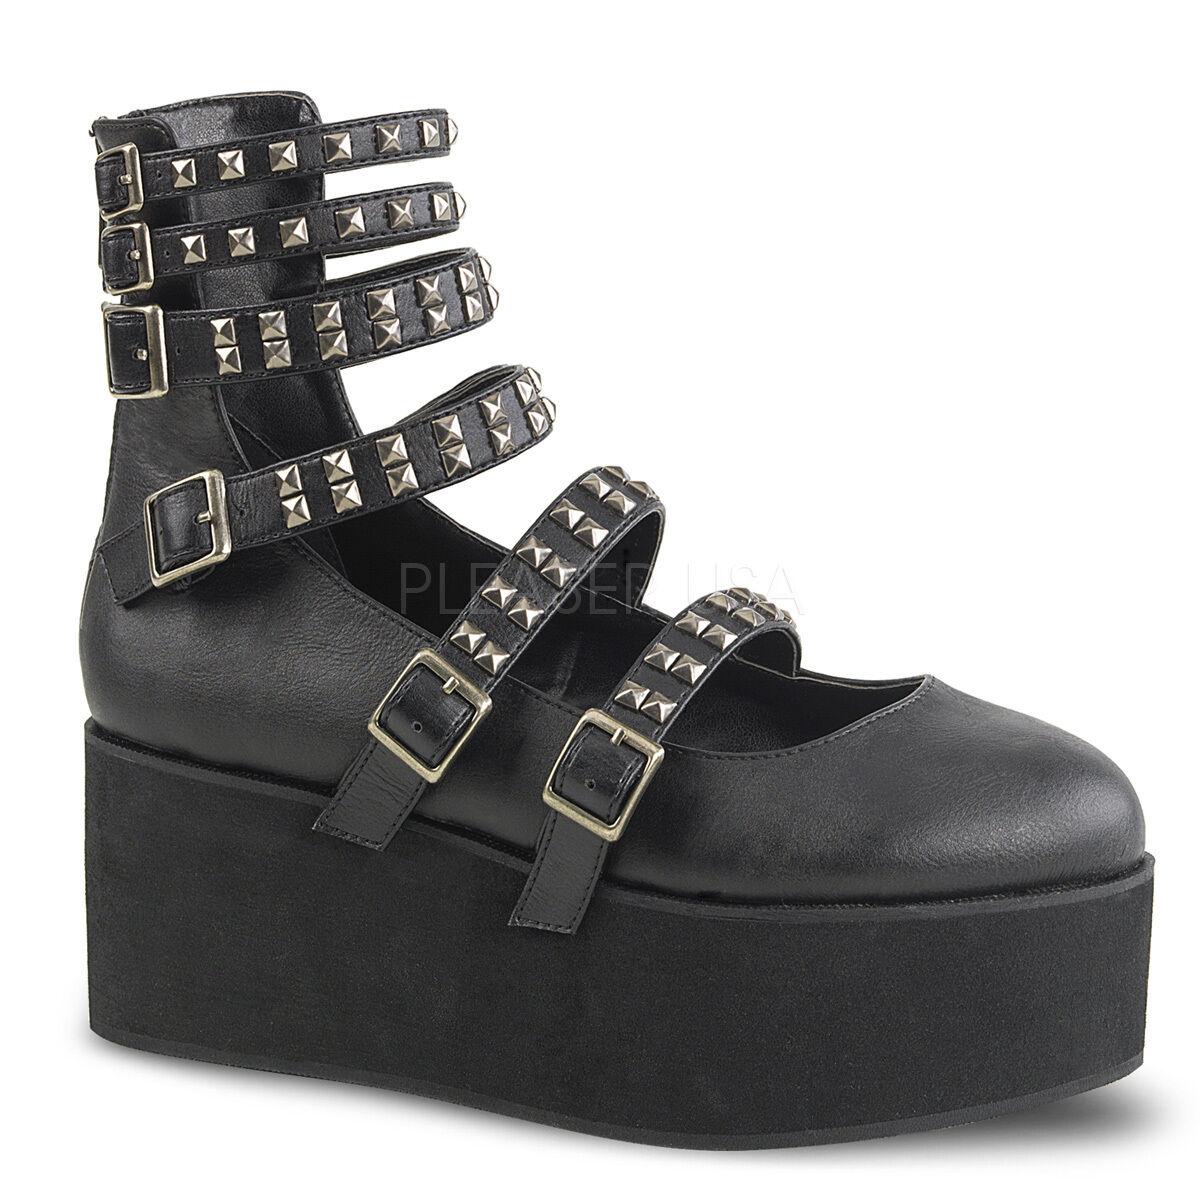 DEMONIA GRIP31 GRIP31 GRIP31 BVL Goth Punk Platform Black Strappy Mary Jane Women shoes 333f79